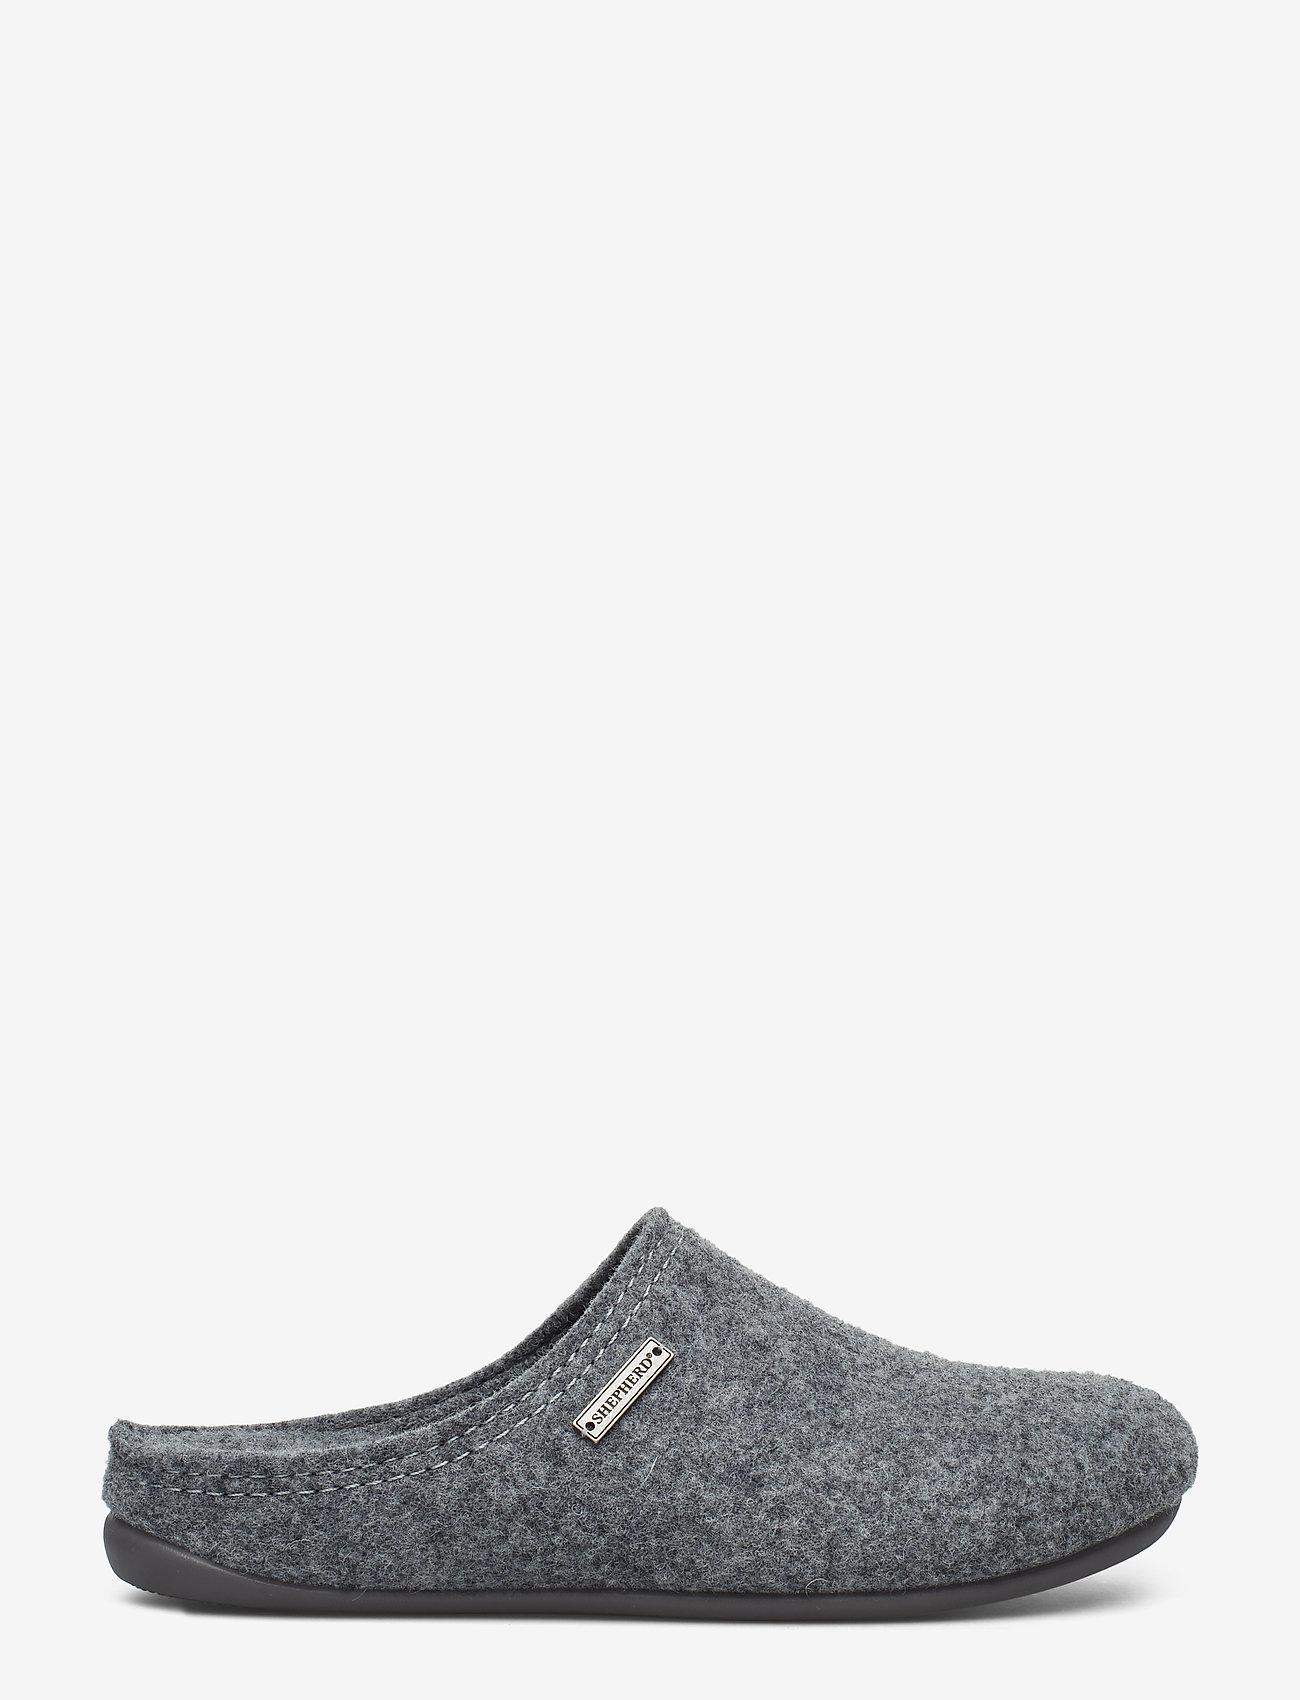 Shepherd - CILLA - pantoffels - grey - 1